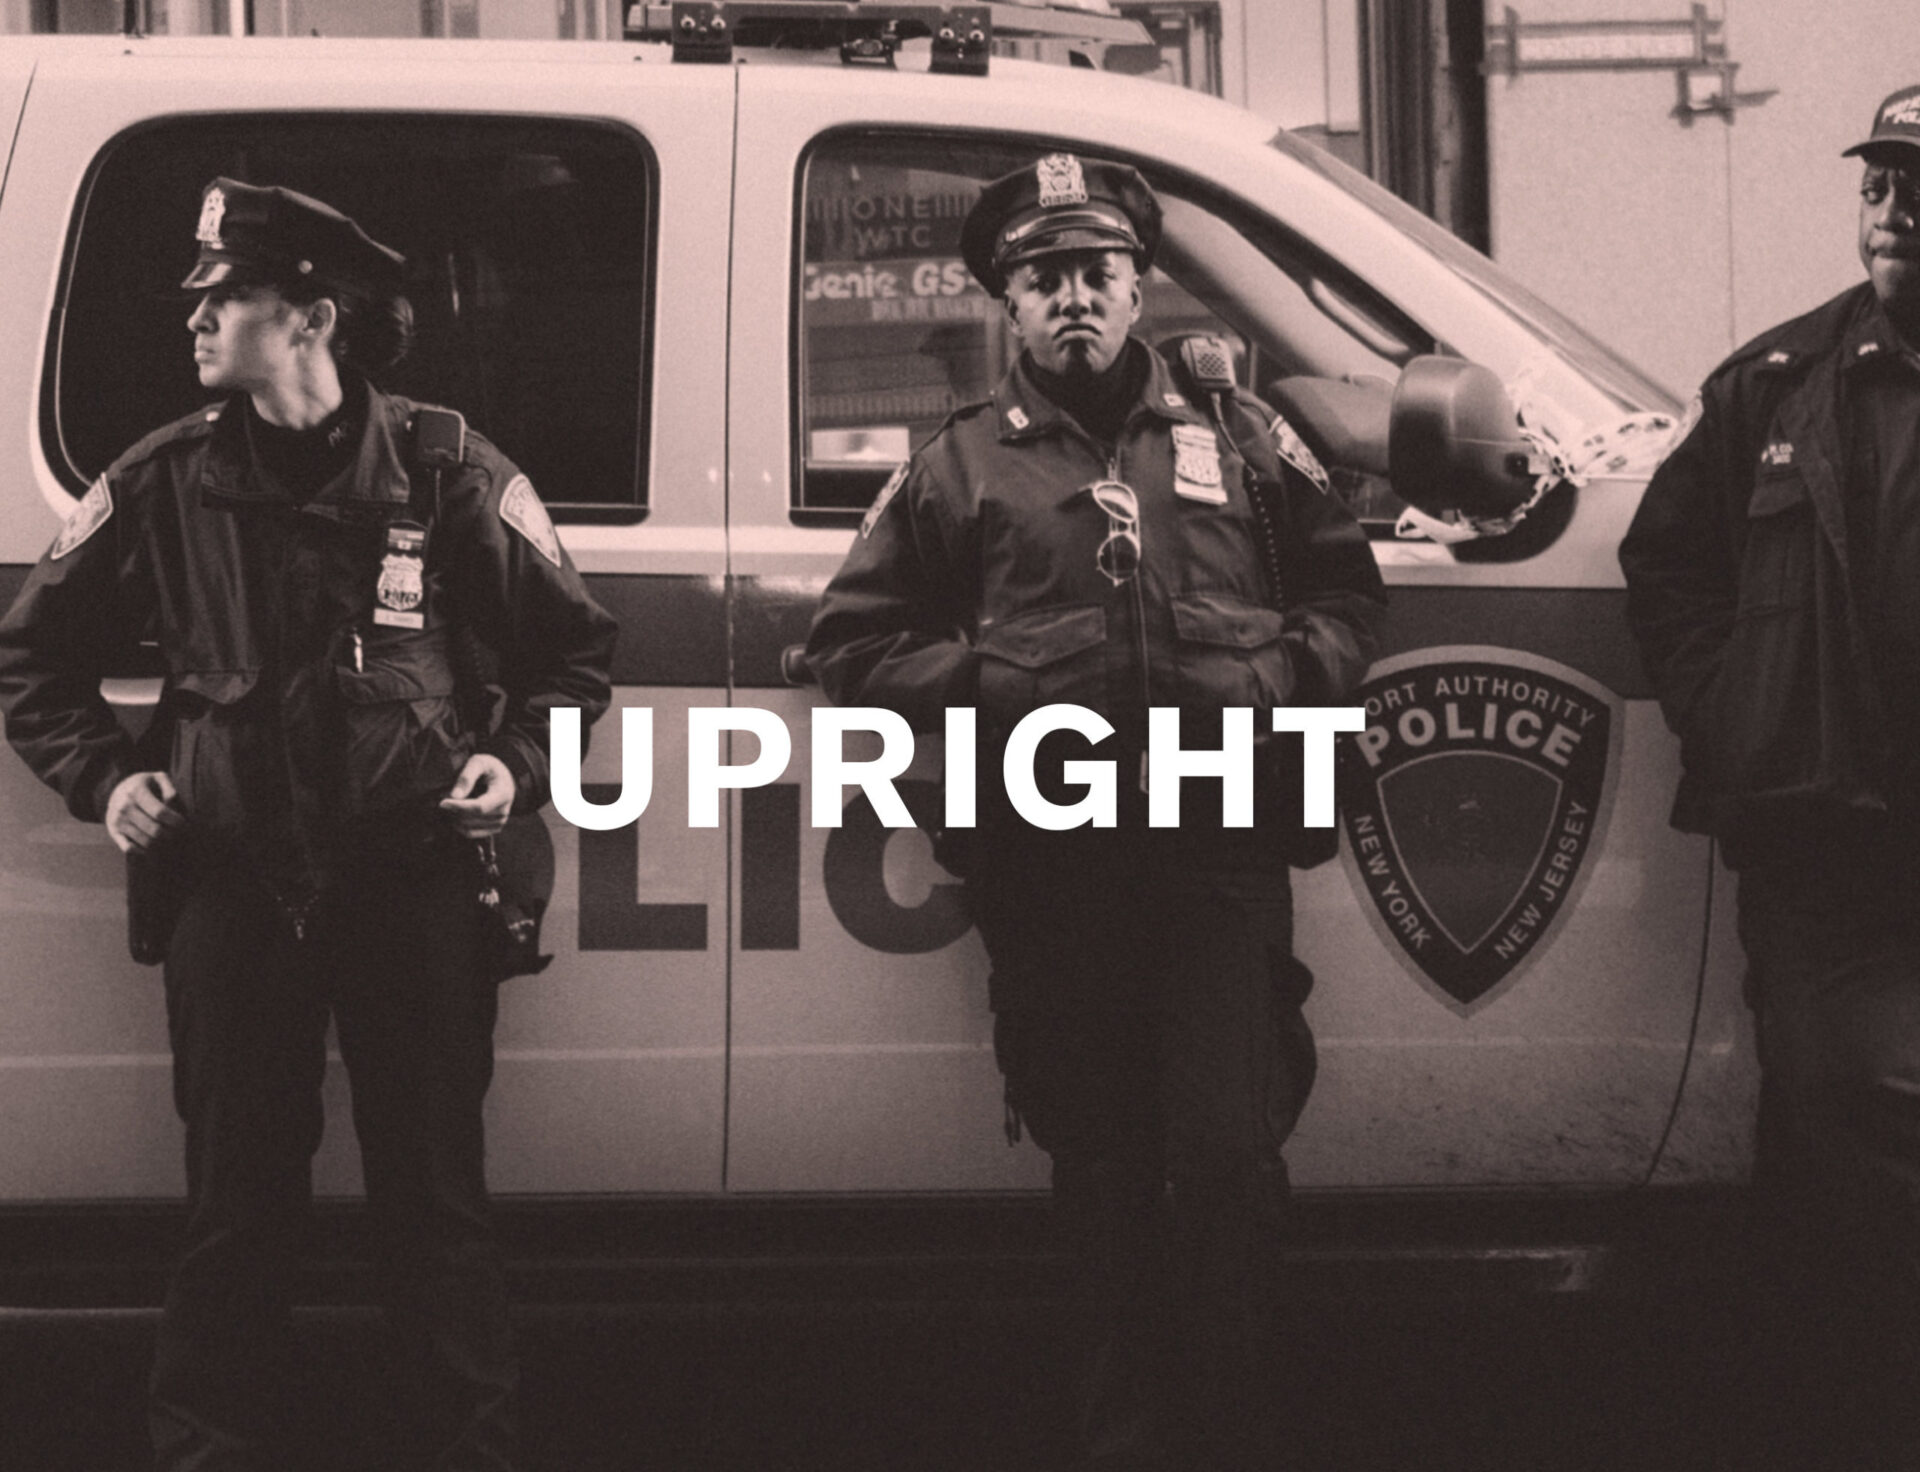 CitizensUnion_Upright